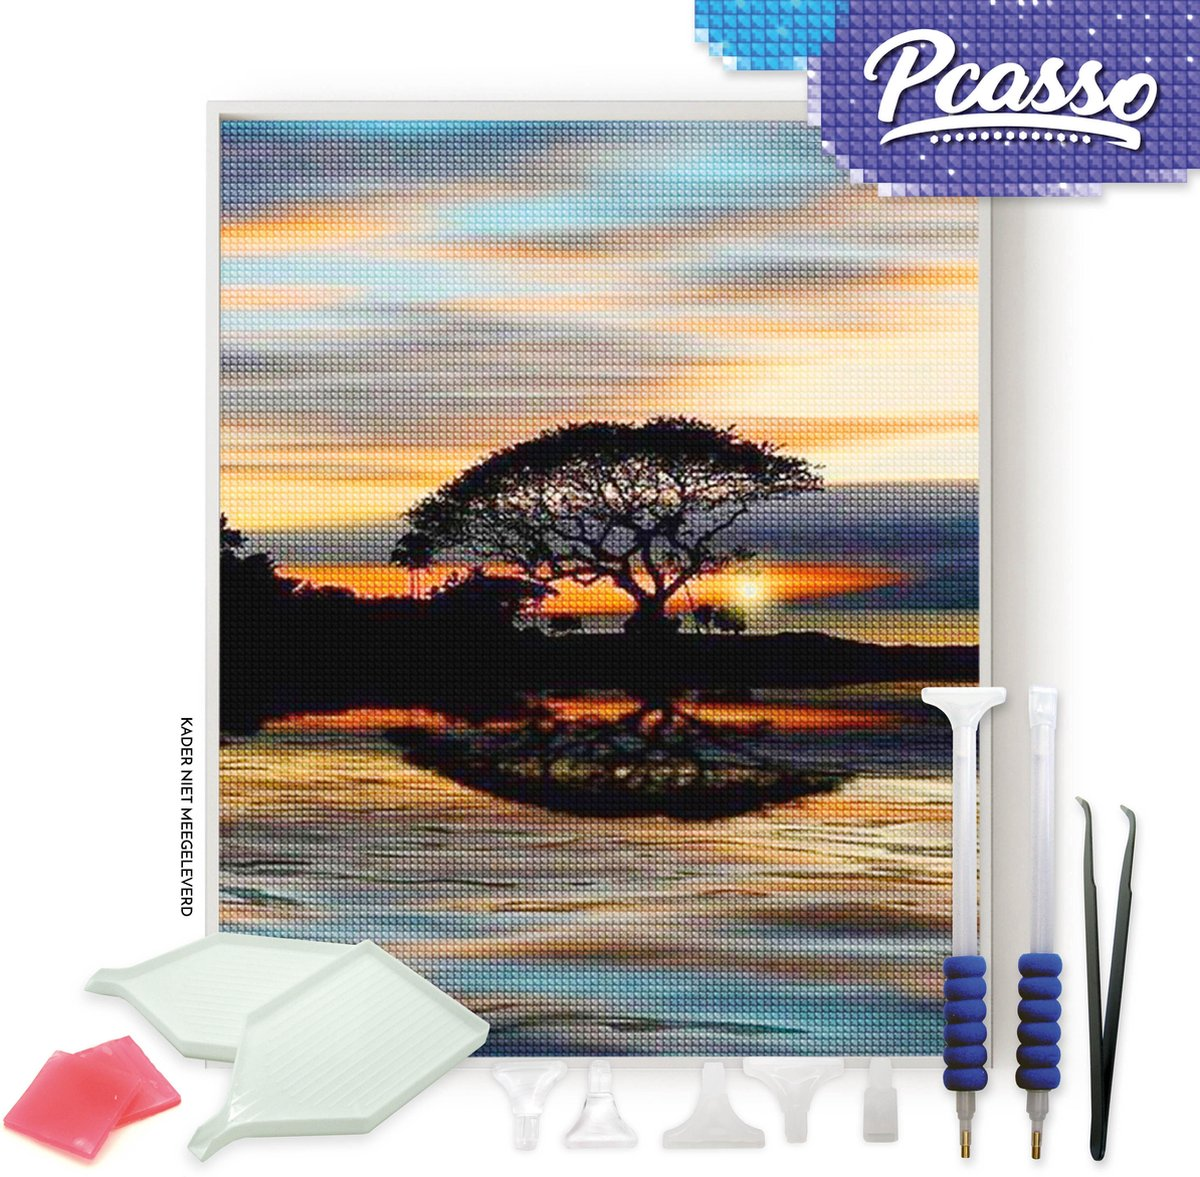 Pcasso ® Zonsondergang - Diamond Painting - Incl. Veel Diamond Painting Accessoires - Diamond Painting Kinderen - Diamond Painting Dieren - Diamond painting volwassenen - 30x40 CM